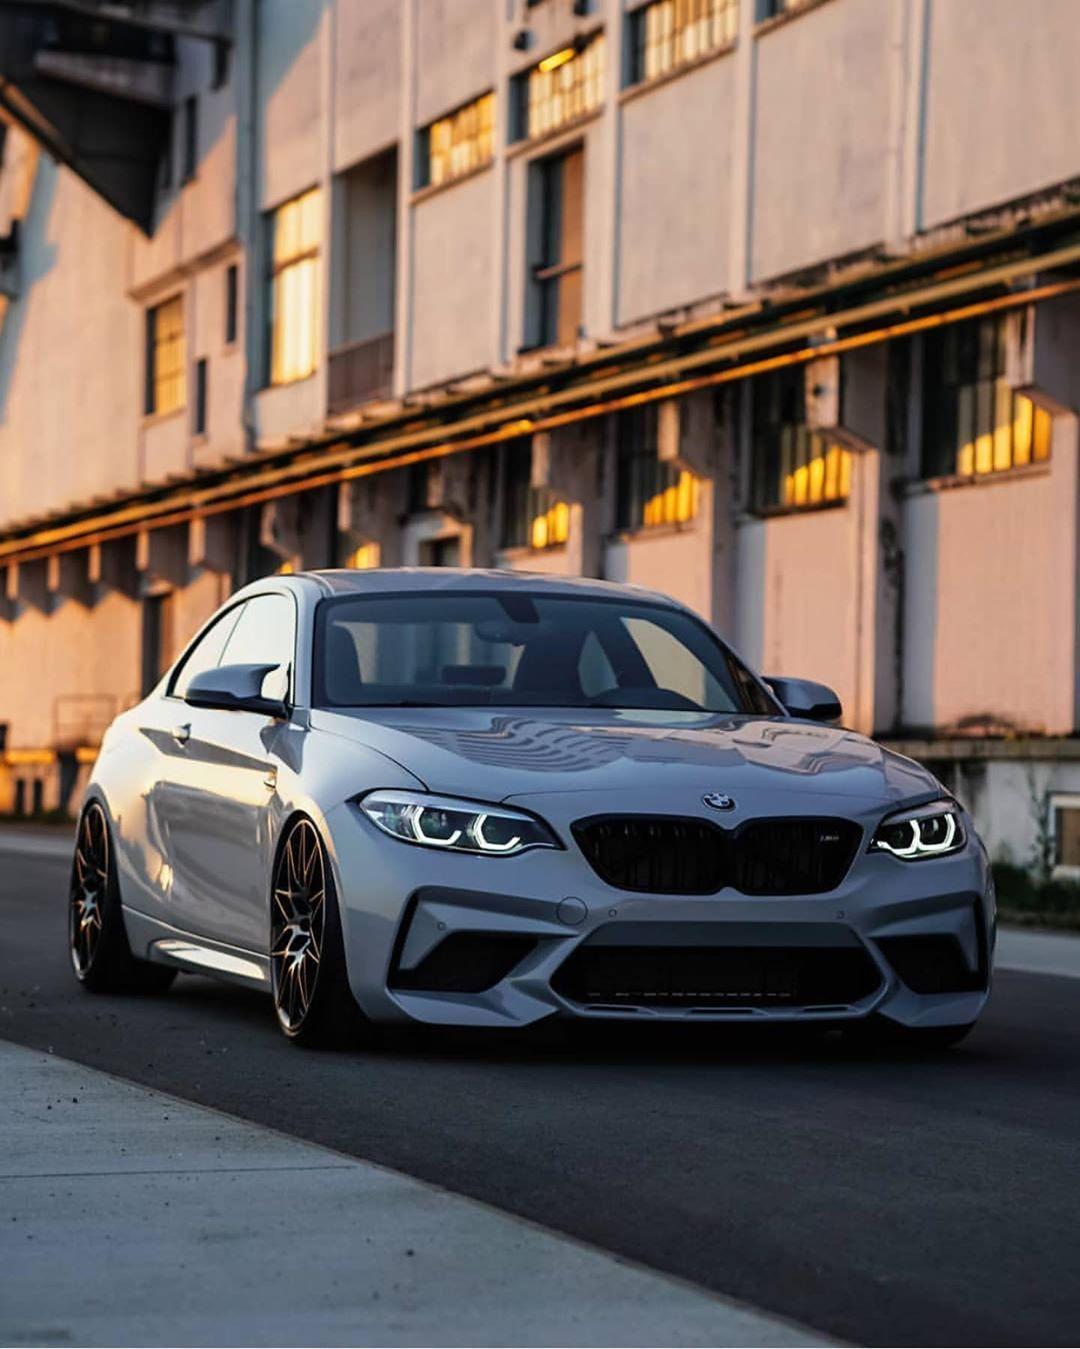 Épinglé par benabdellah abdellatif sur BMW